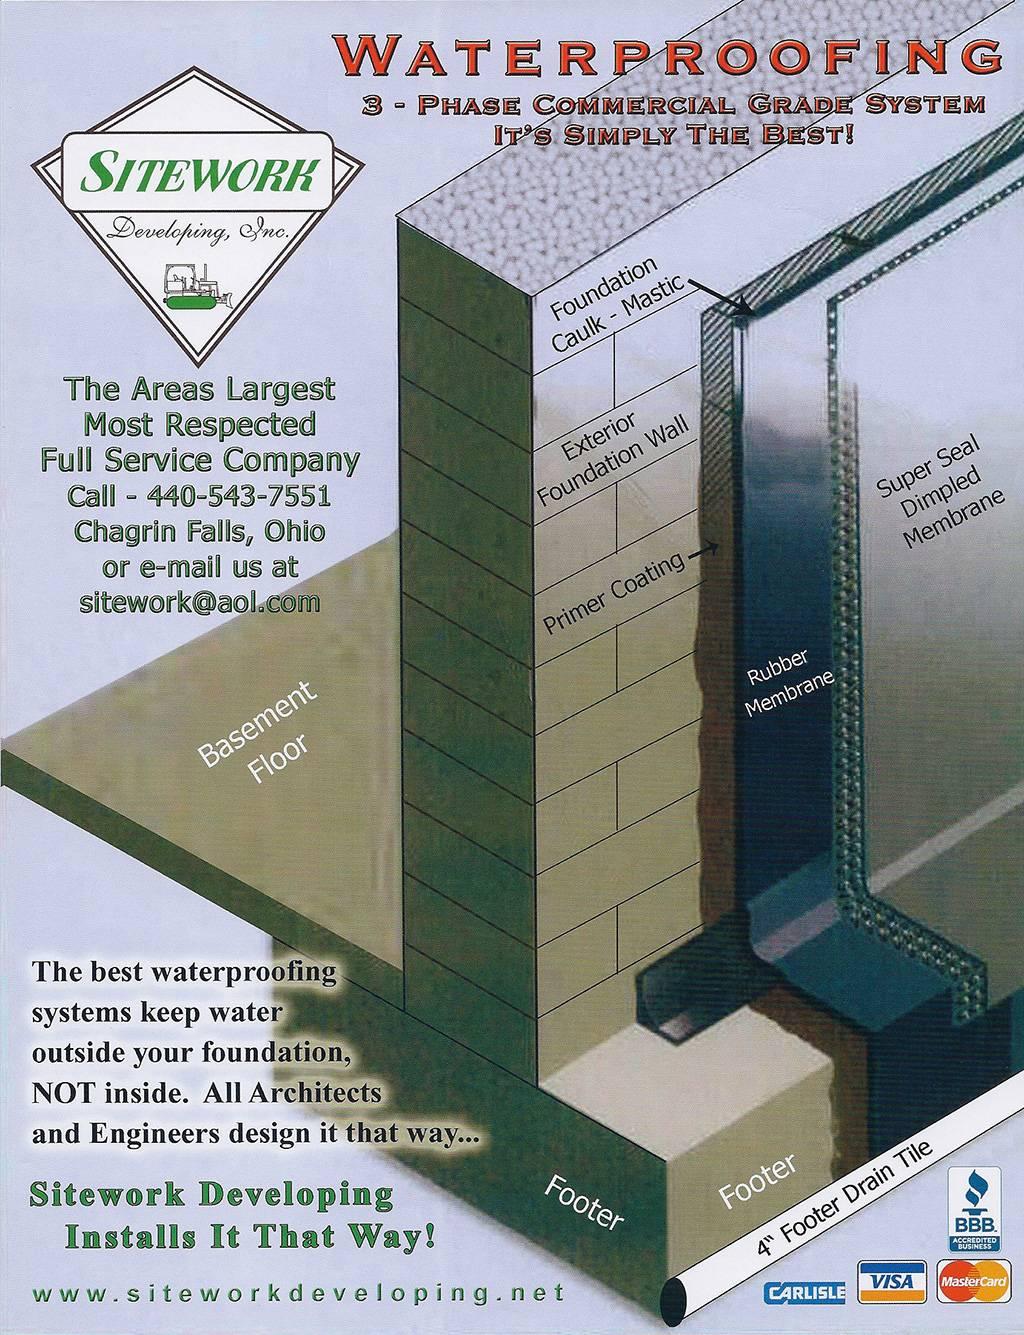 Waterproofing Flyer